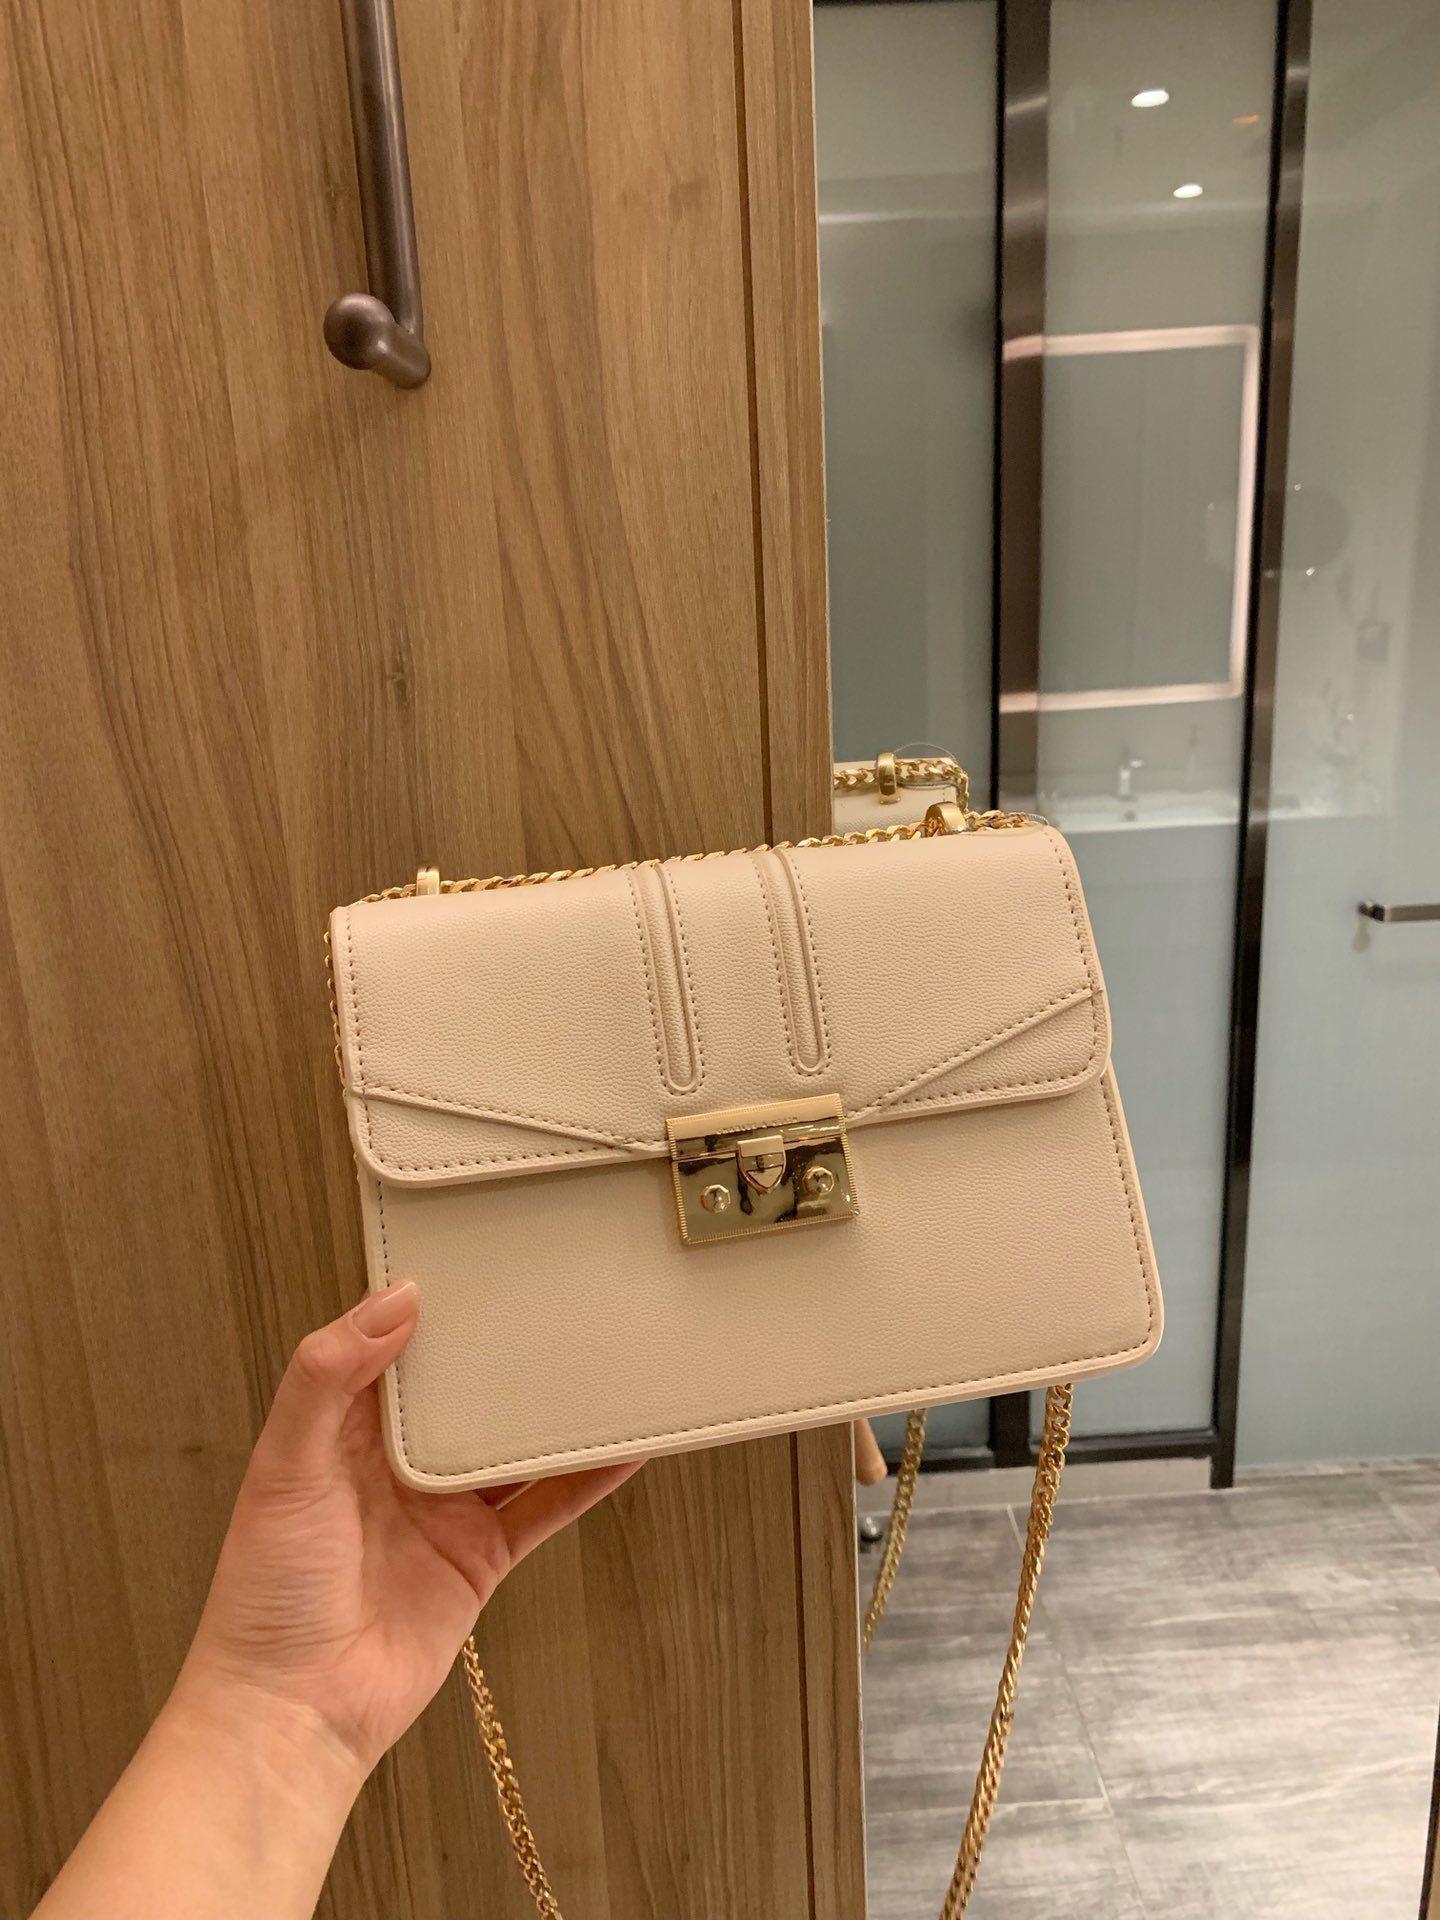 2020 neue, qualitativ hochwertige Damentasche # 11 DBSJQ8W9